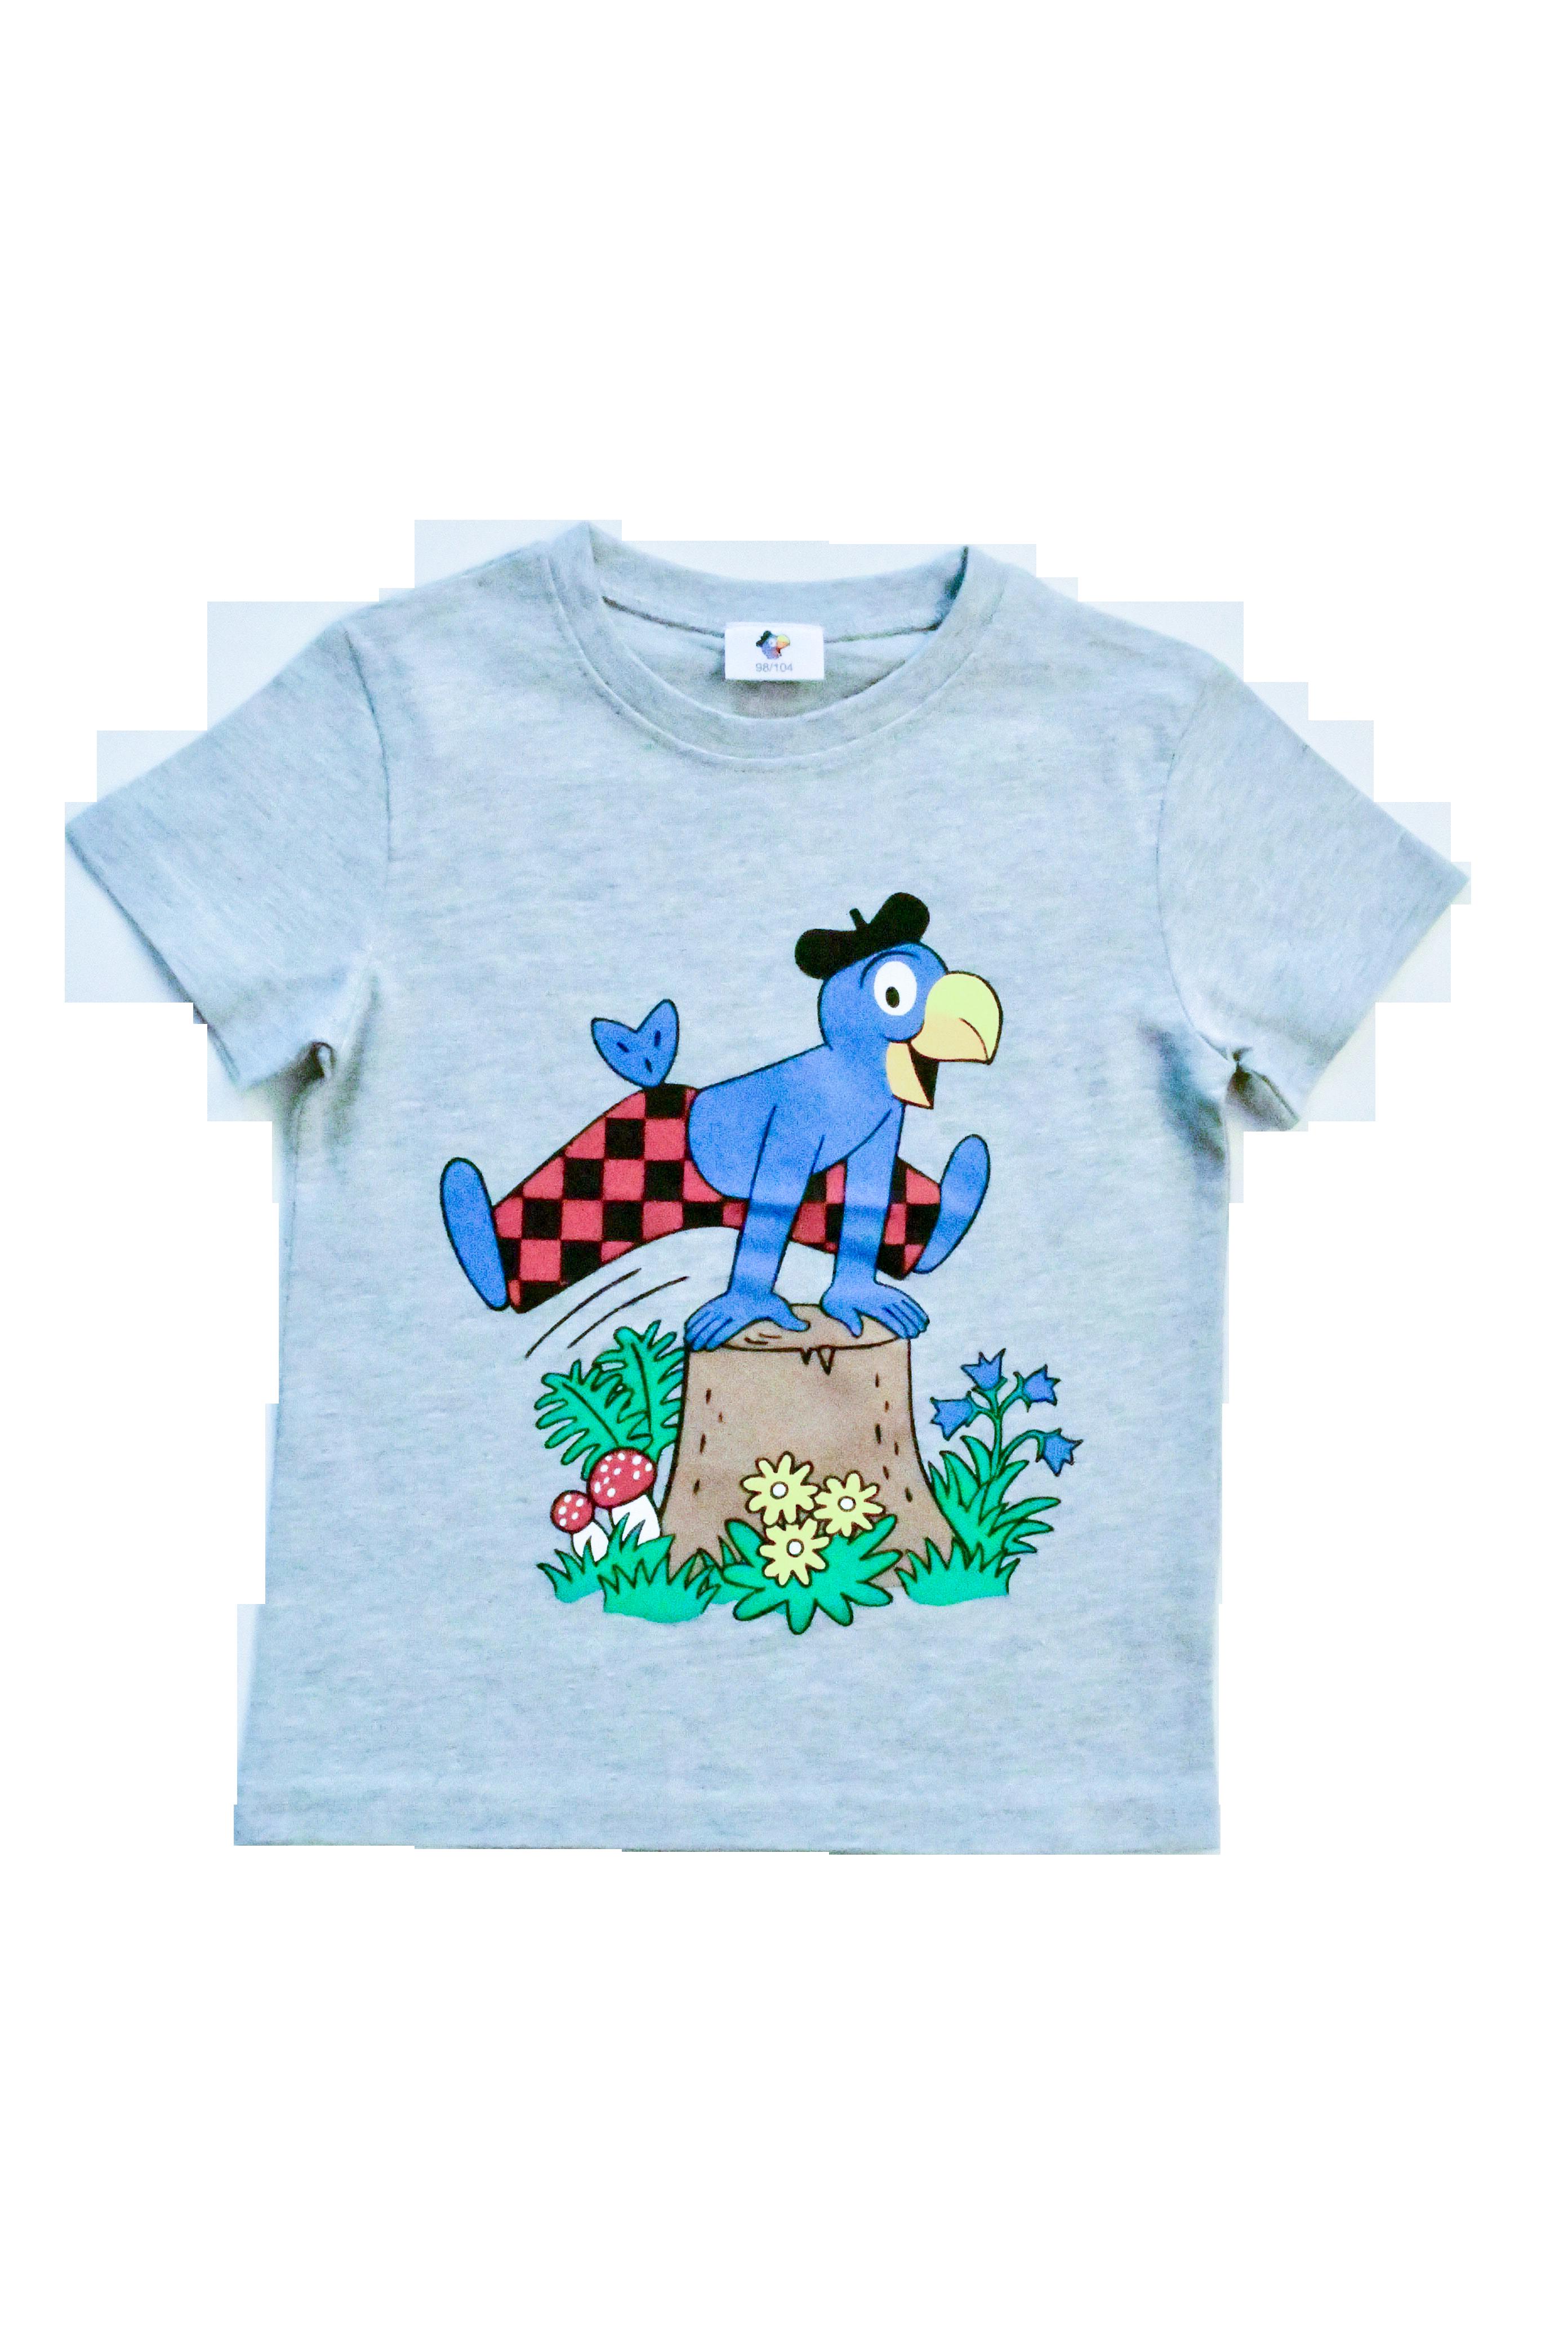 Globi T-Shirt grau Sprung 134/140